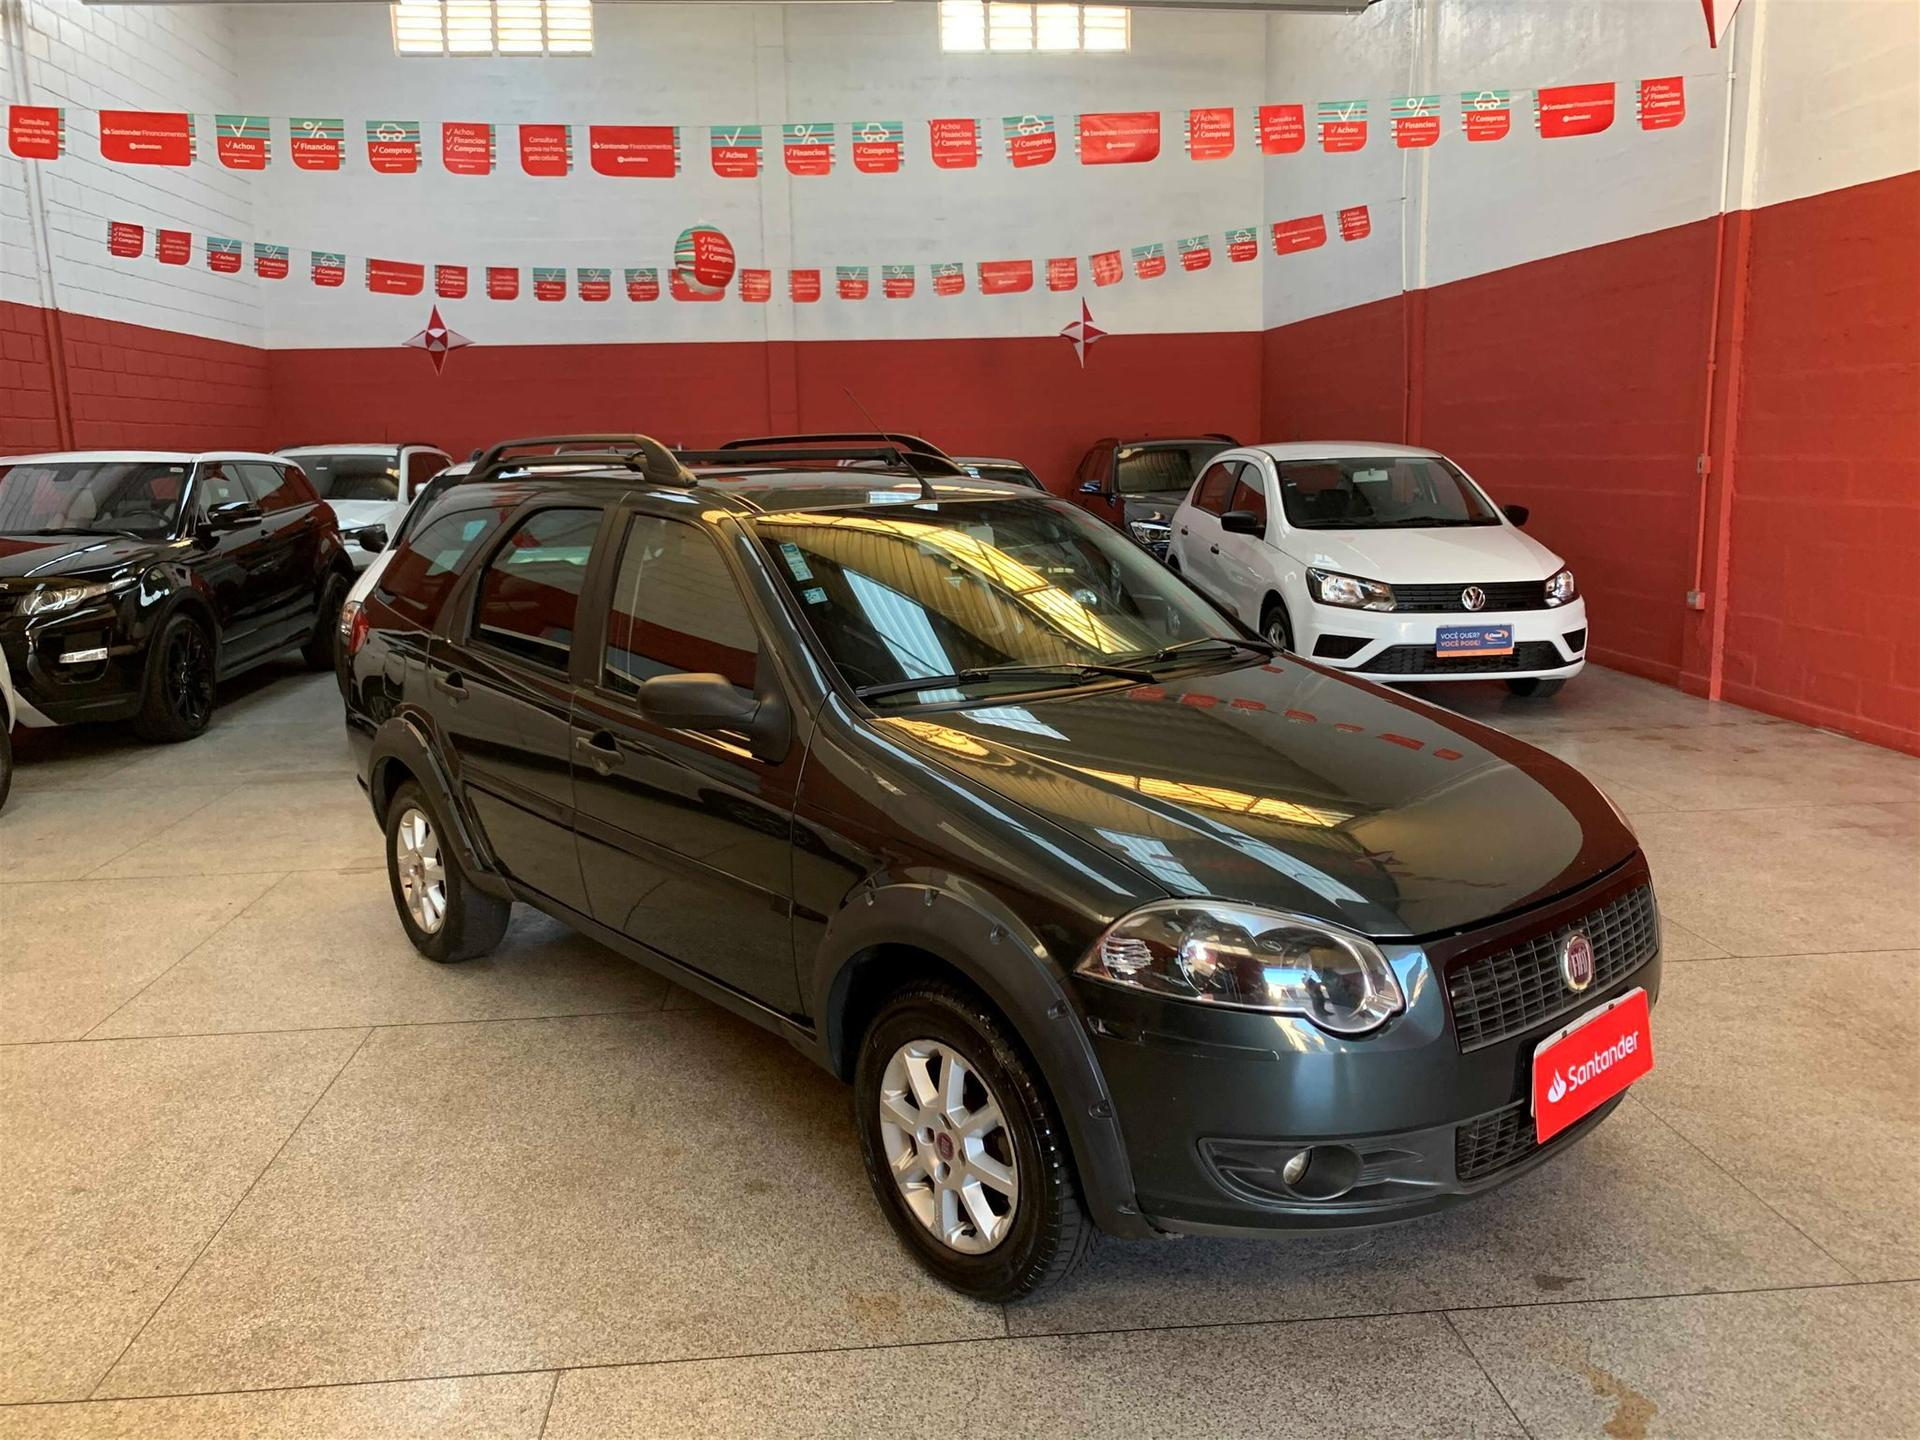 Fiat Palio 1.4 Mpi Trekking Weekend 8v Flex 4p Manual Wmimagem20203567888